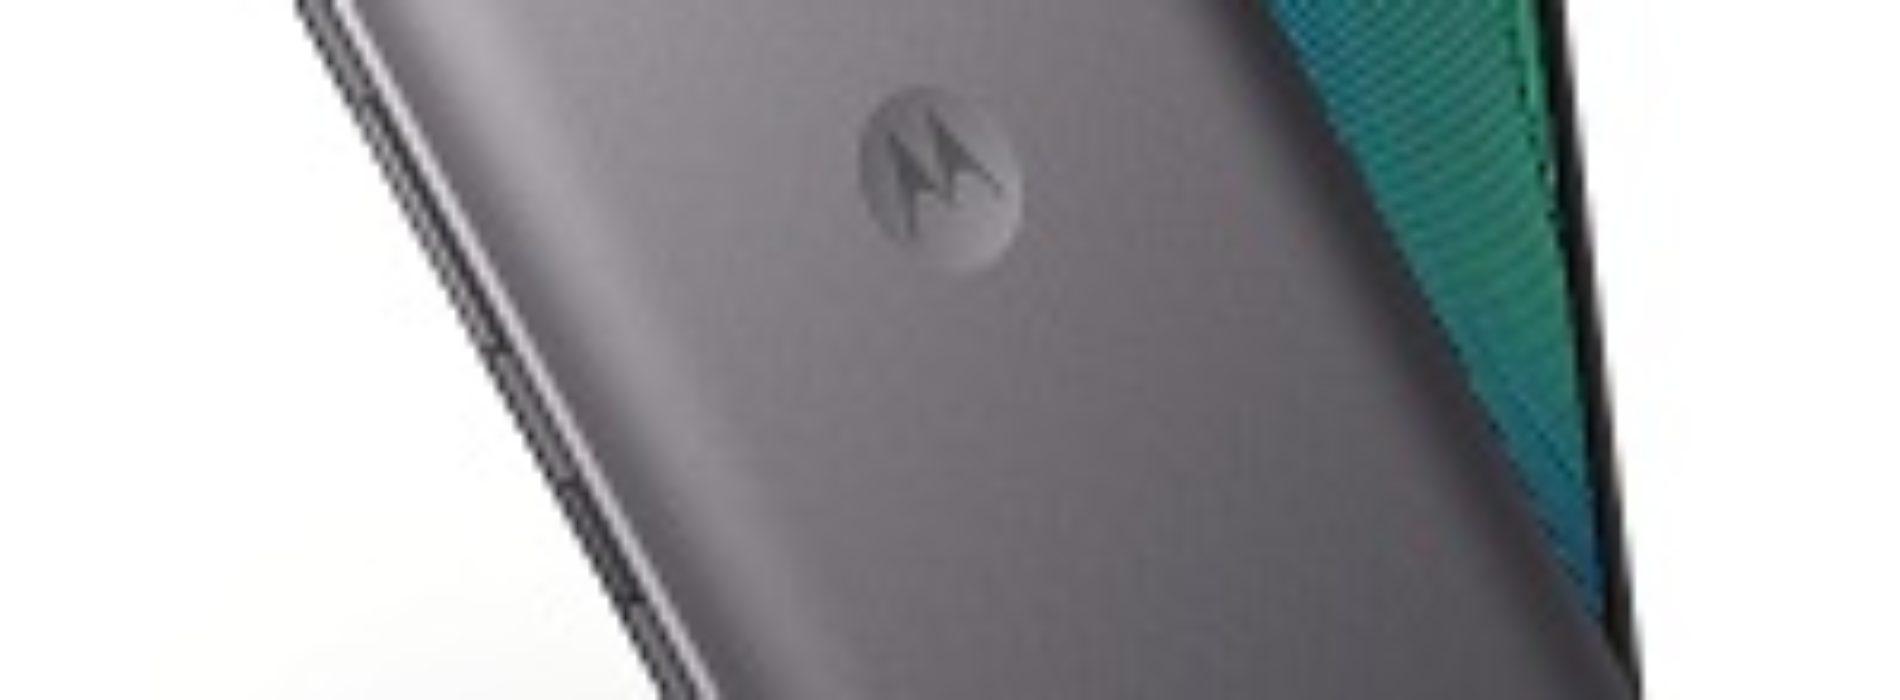 Presentan primer Smartphone con doble cámara principal